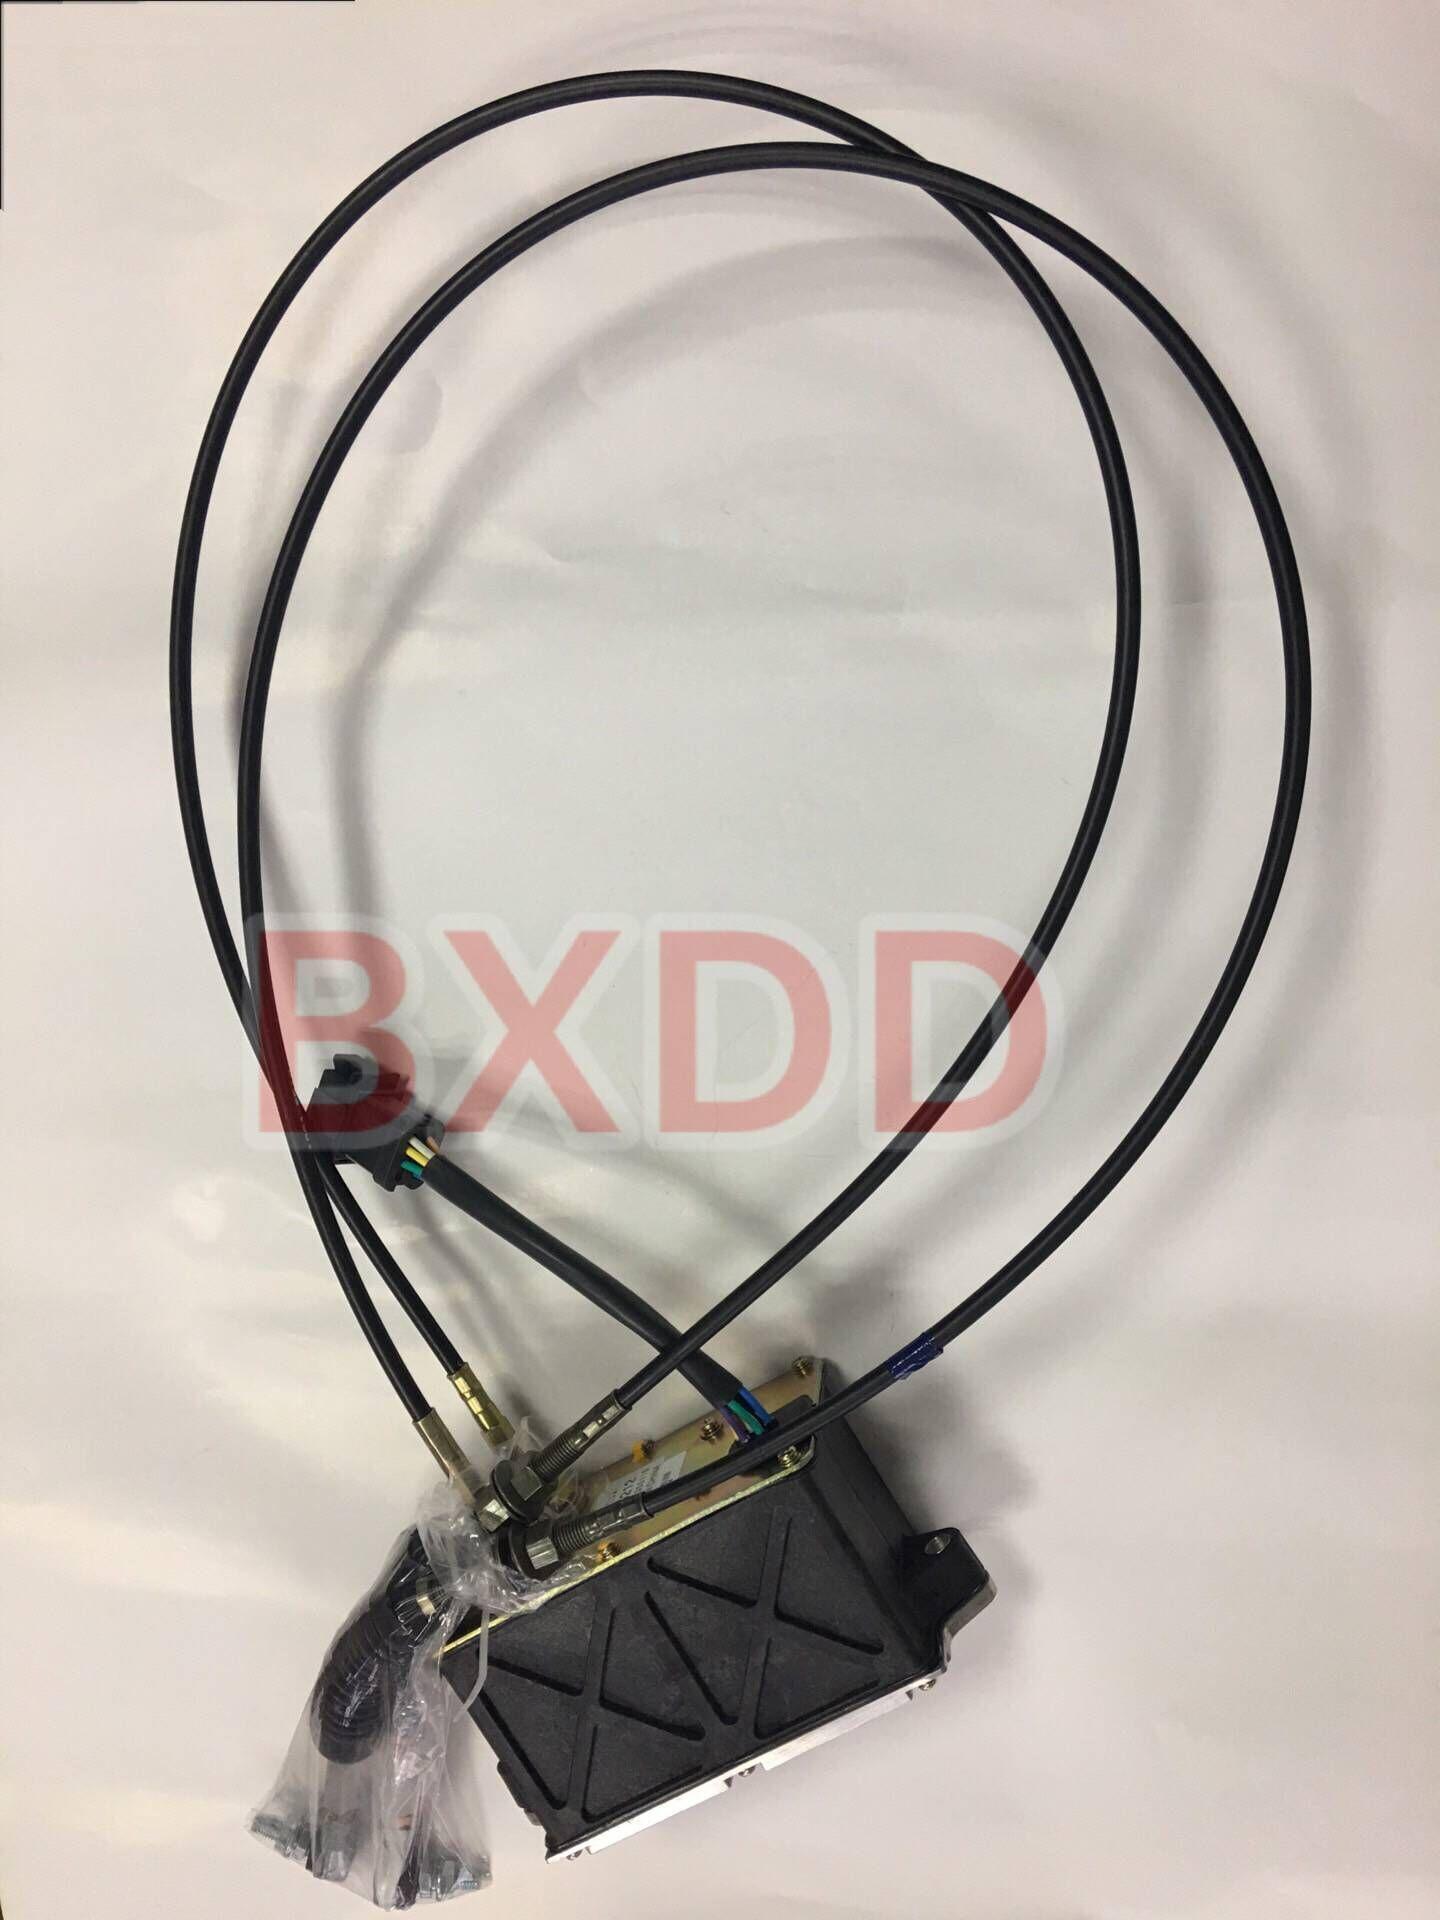 2018 E312c 320c Throttle Motor 247 5207 E312c Speed Gas Accelerator ...